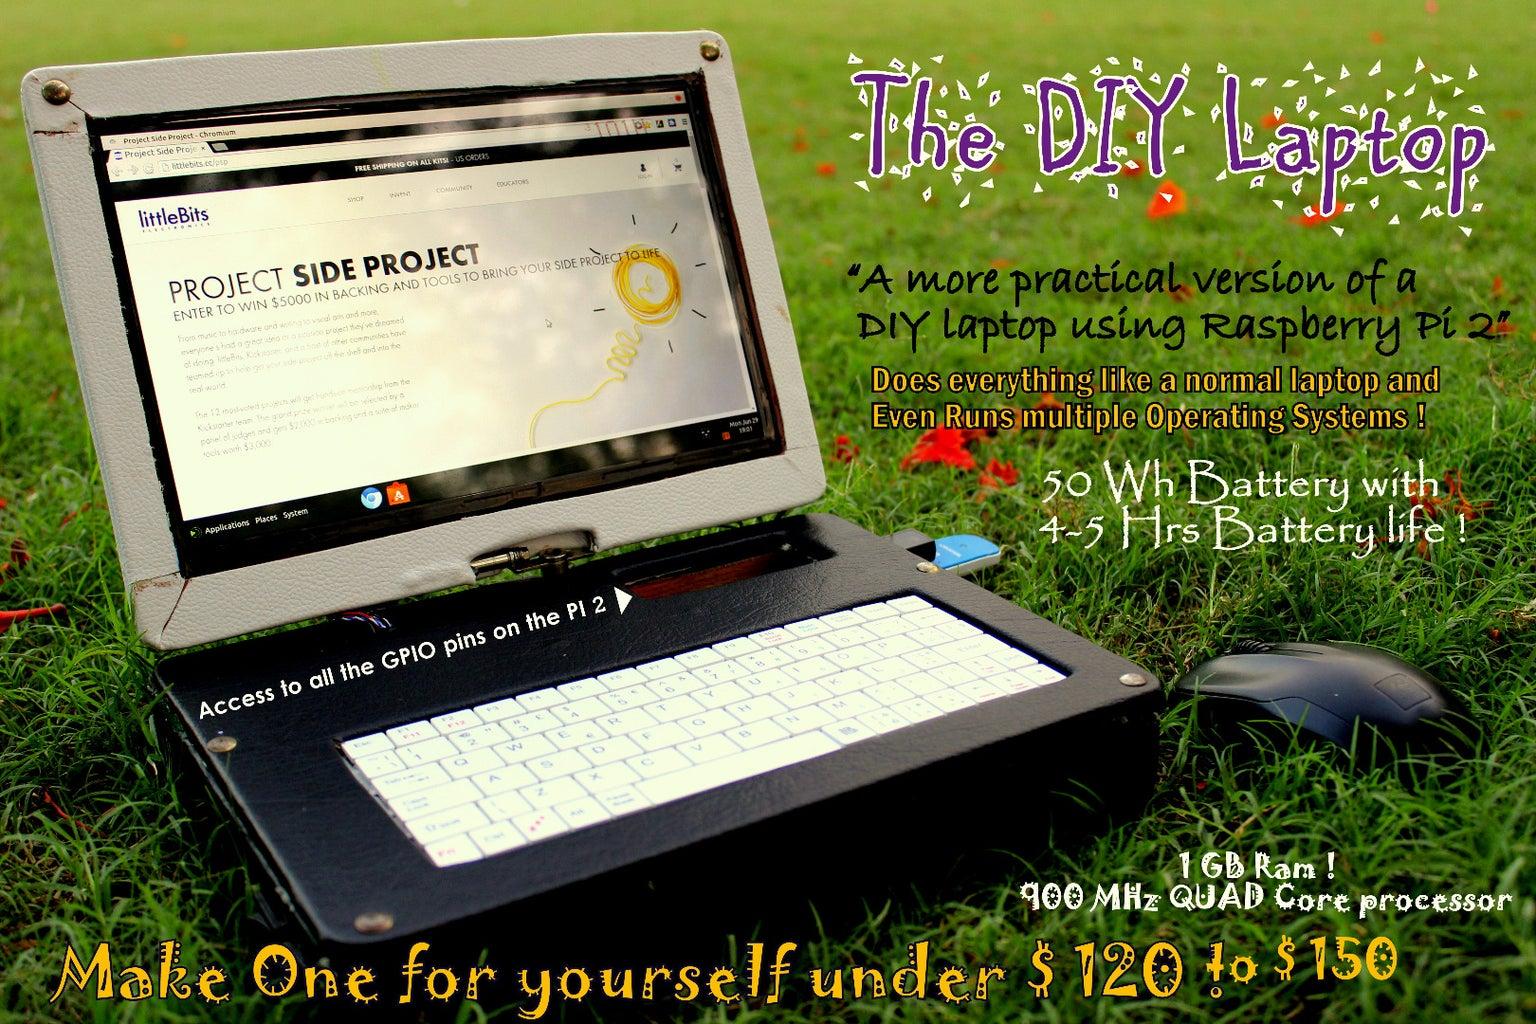 Pi-Berry Laptop-- the Classic DIY Laptop